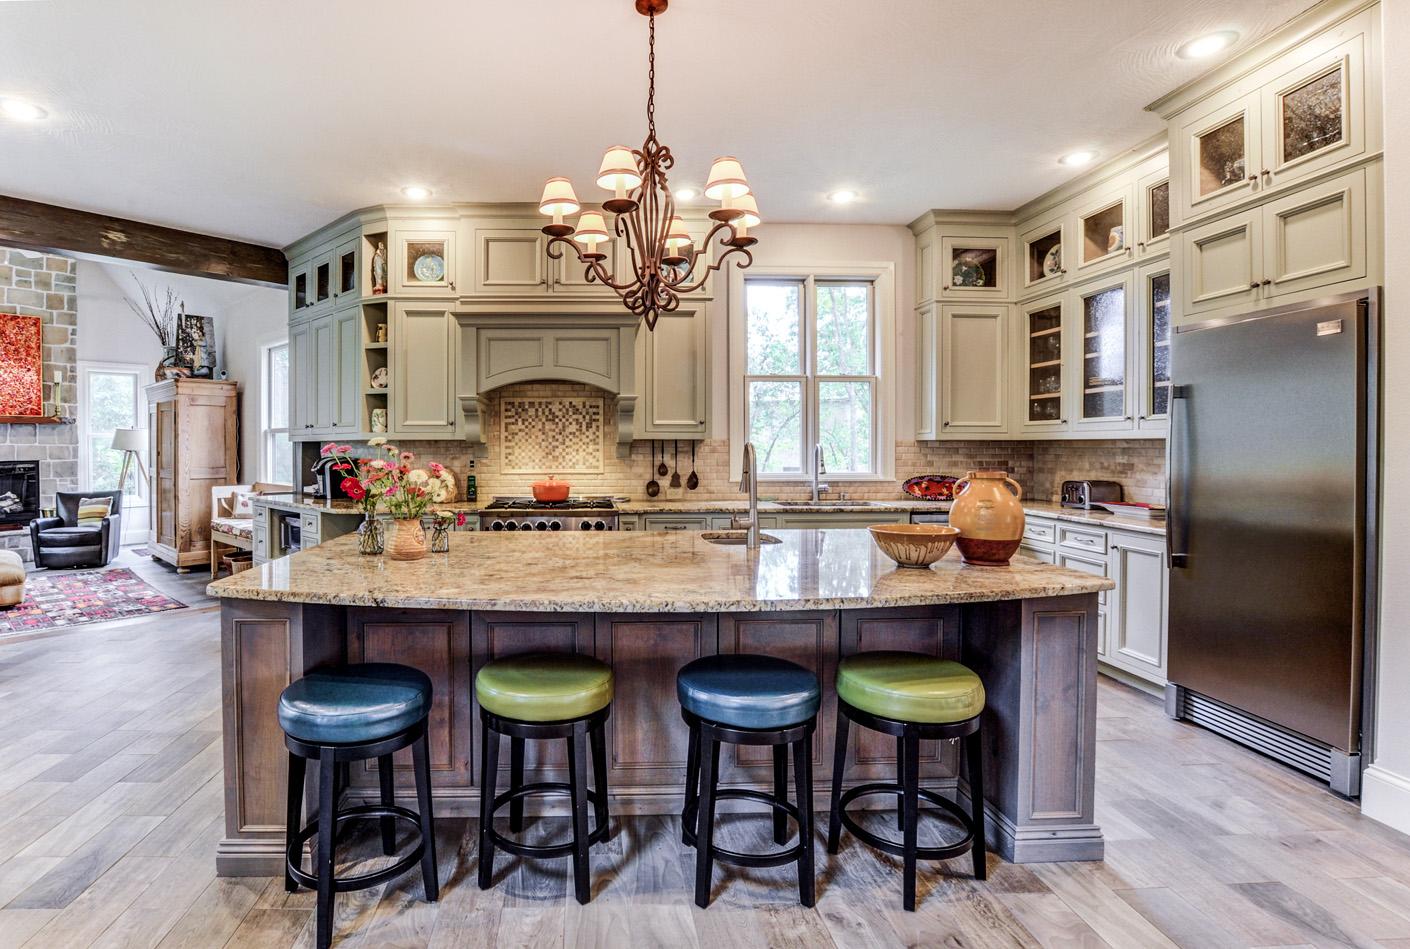 built-by-brett-custom-home-builders-springfield-mo-dunrobin-008.jpg